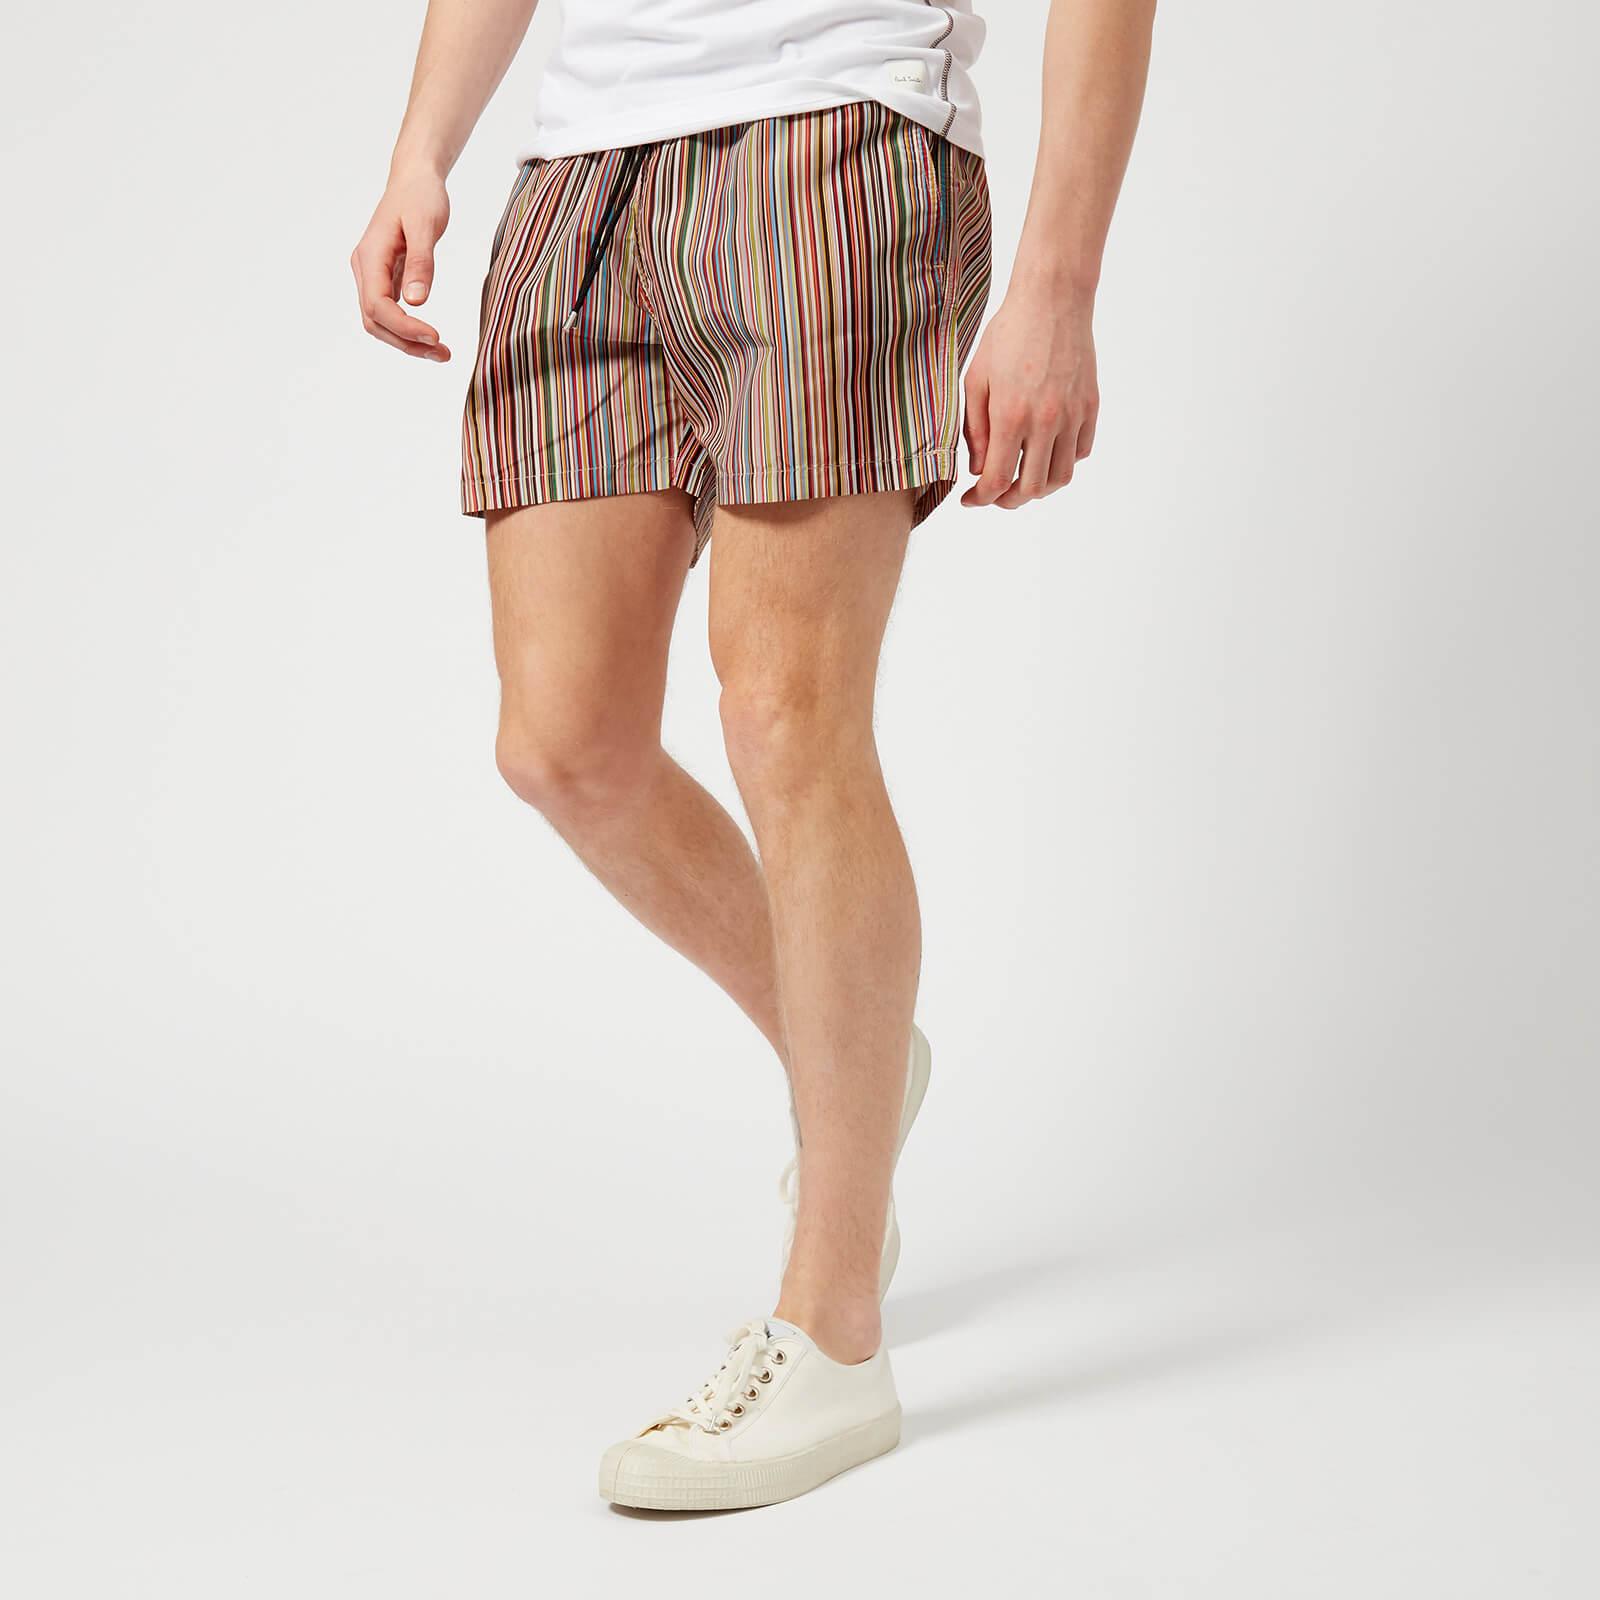 f921aa9968 Paul Smith Accessories Men's Classic Stripe Swim Shorts - Multi - Free UK  Delivery over £50